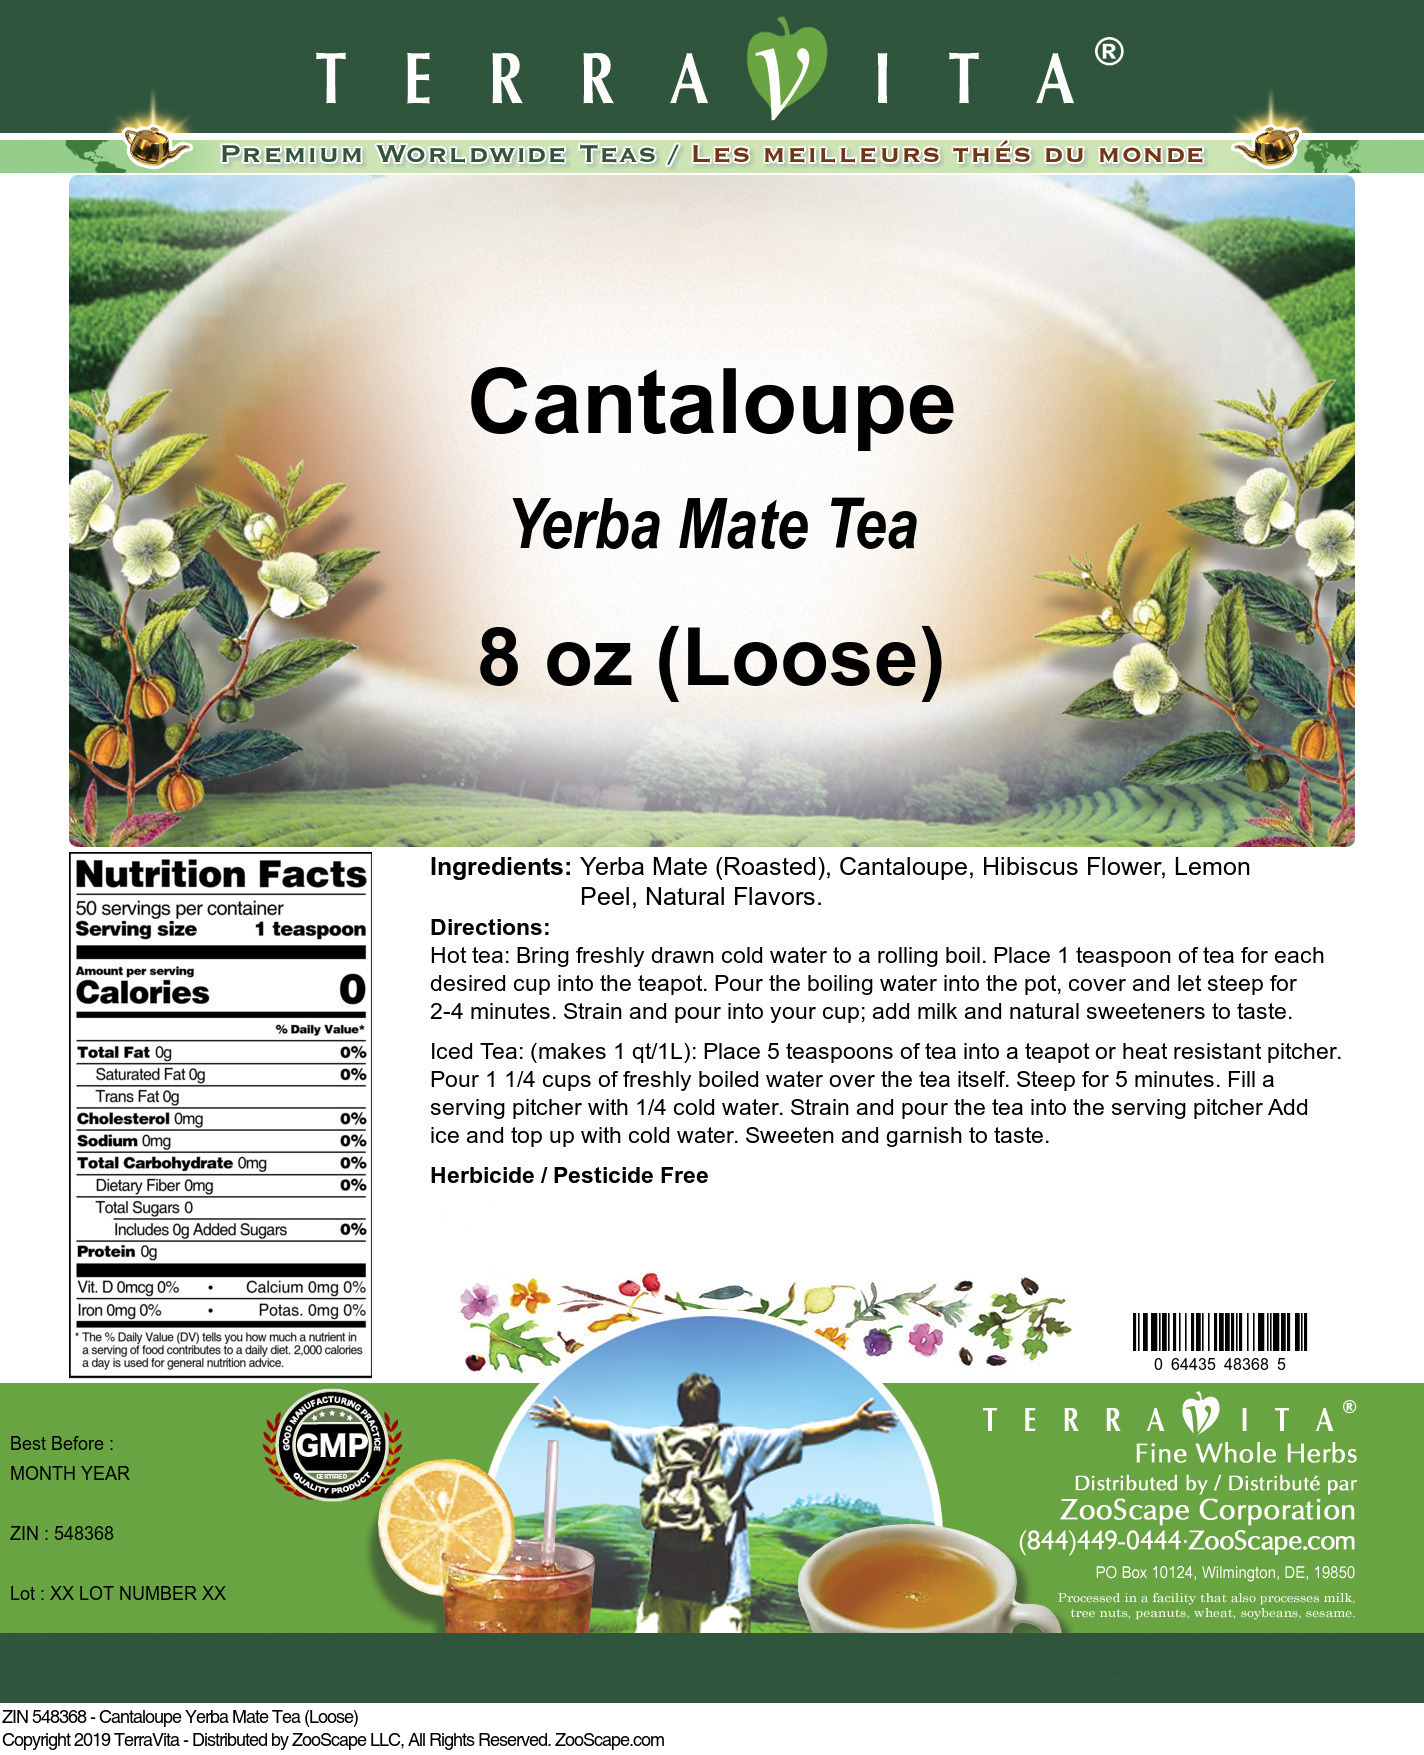 Cantaloupe Yerba Mate